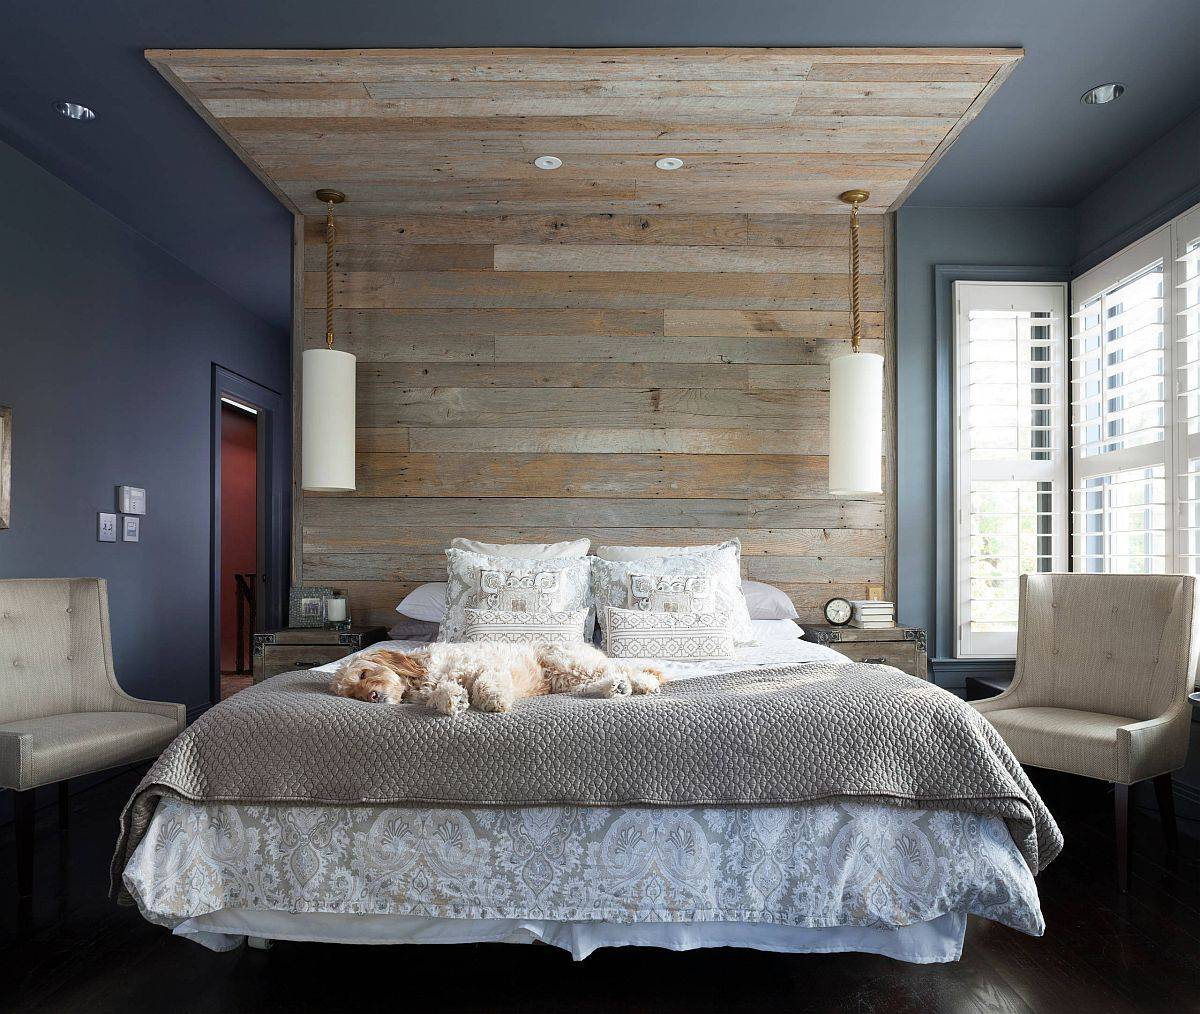 Reklamasi-kayu-panel-buat-a-headboard-yang-berfungsi-all-up-to-the-ceiling-57547